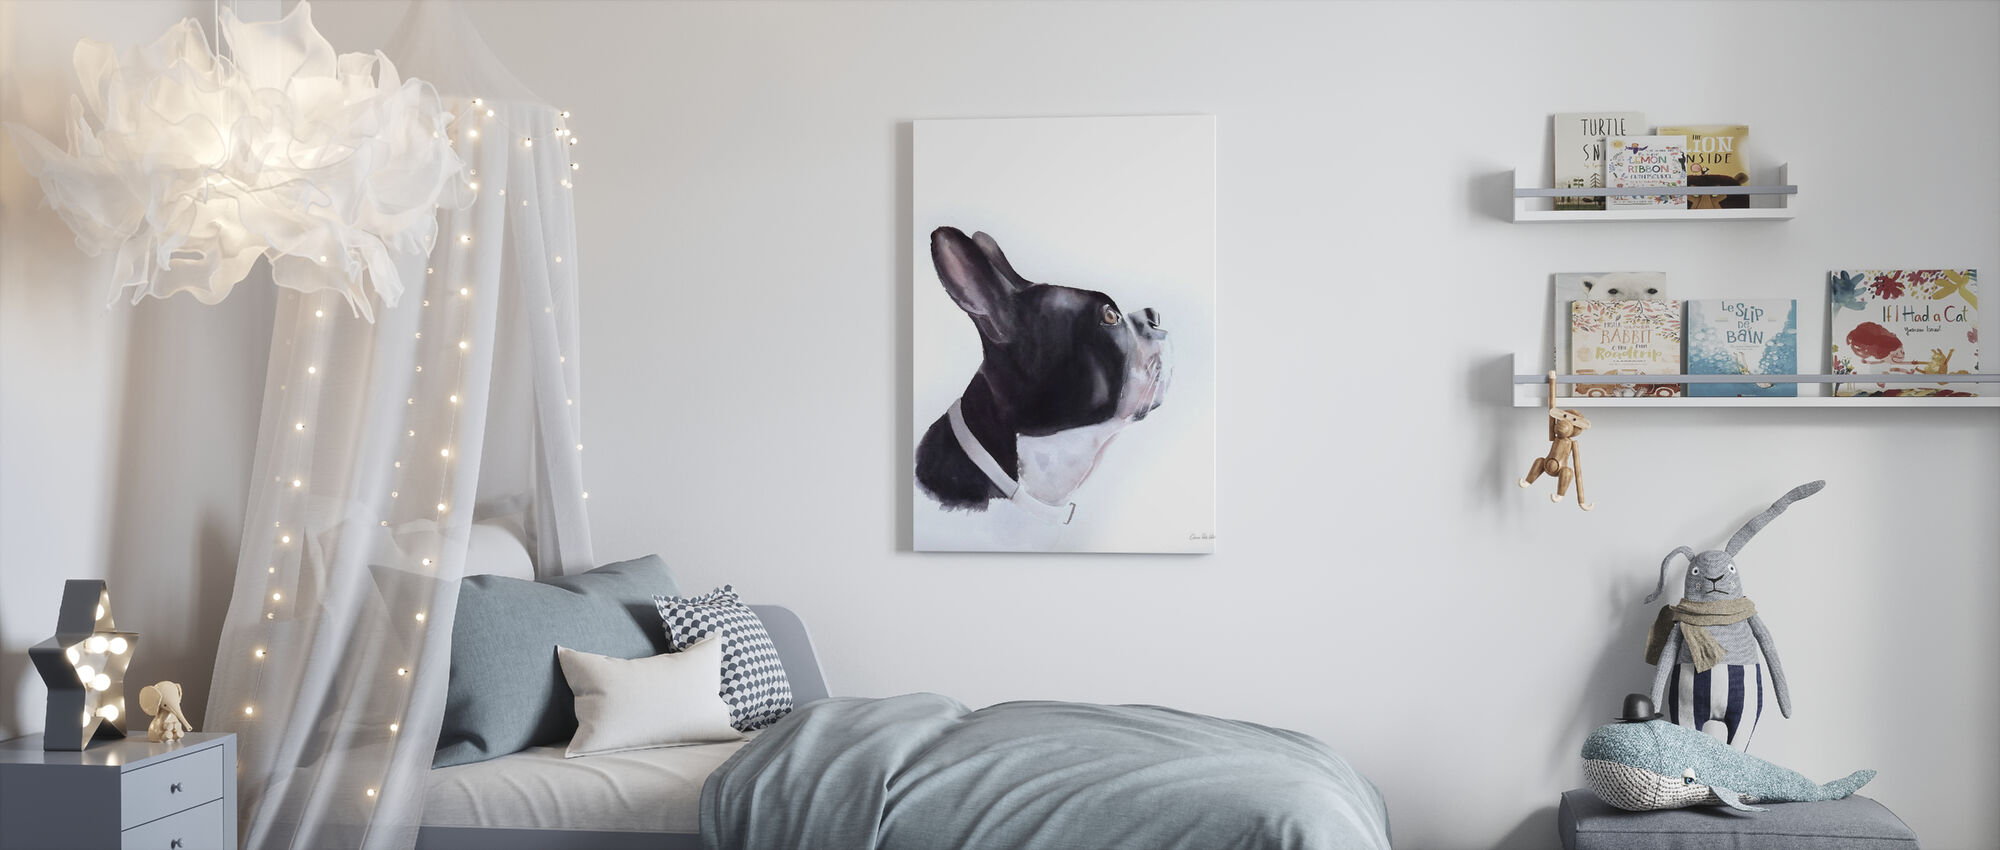 Breakfast Time - Canvas print - Kids Room